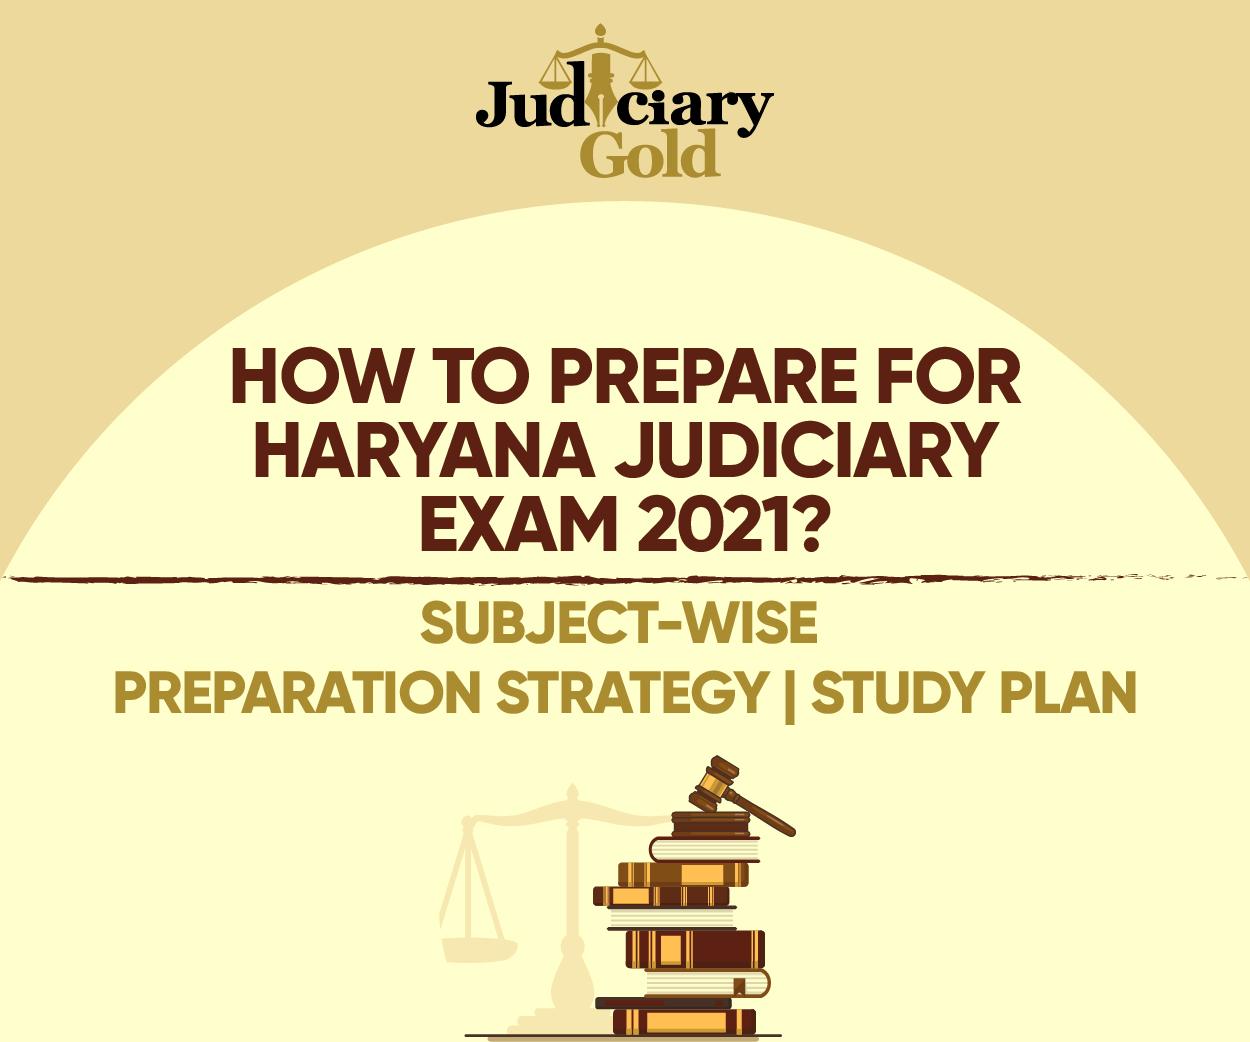 How to prepare for Haryana Judiciary